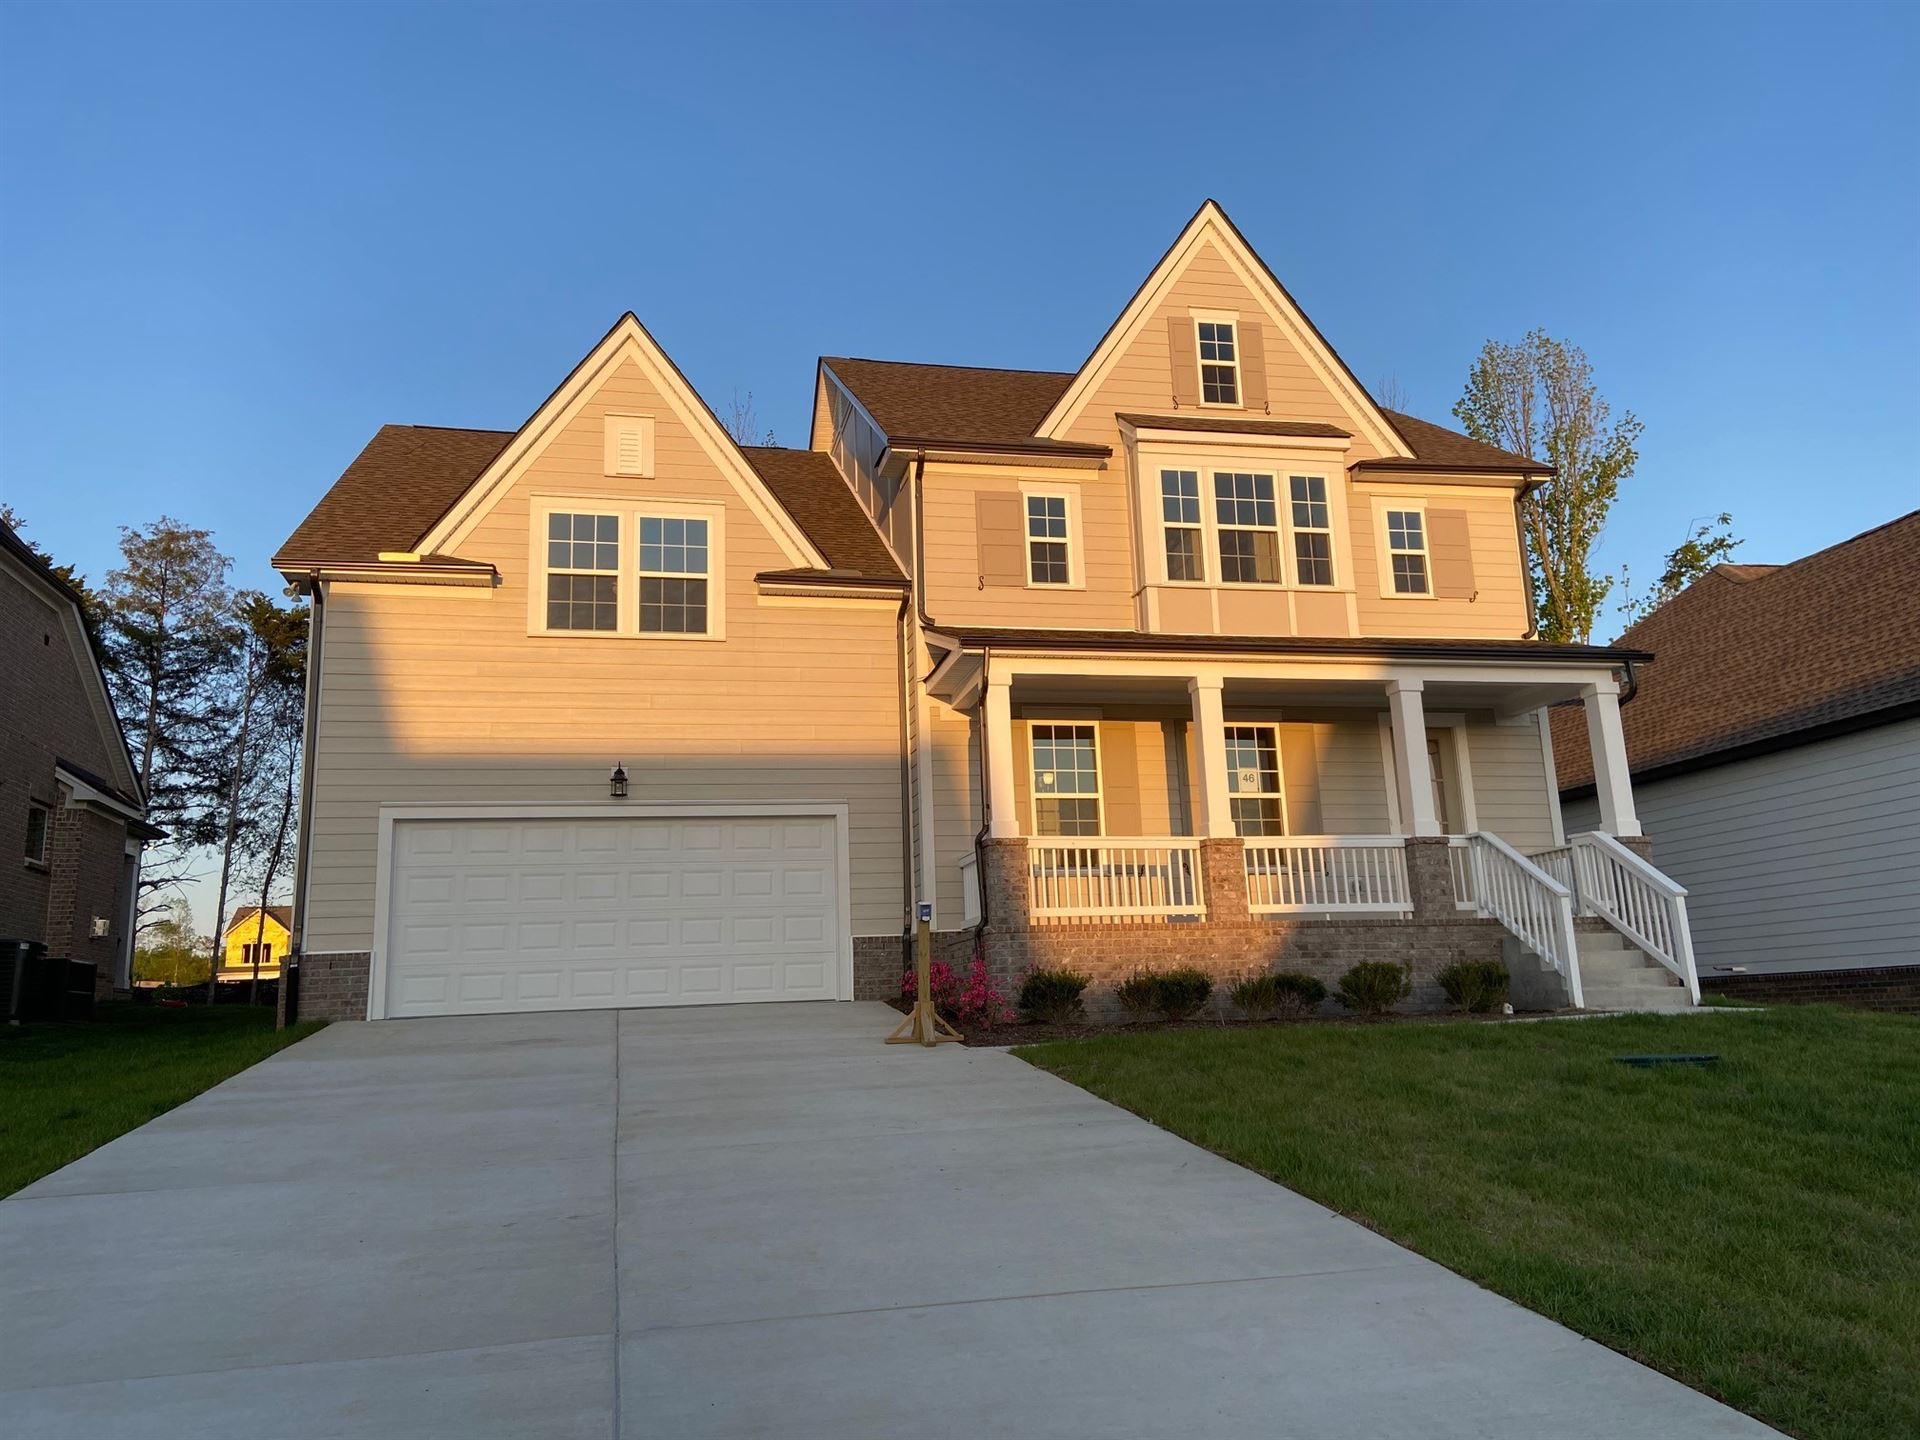 1213 Batbriar Rd, Murfreesboro, TN 37128 - MLS#: 2247498